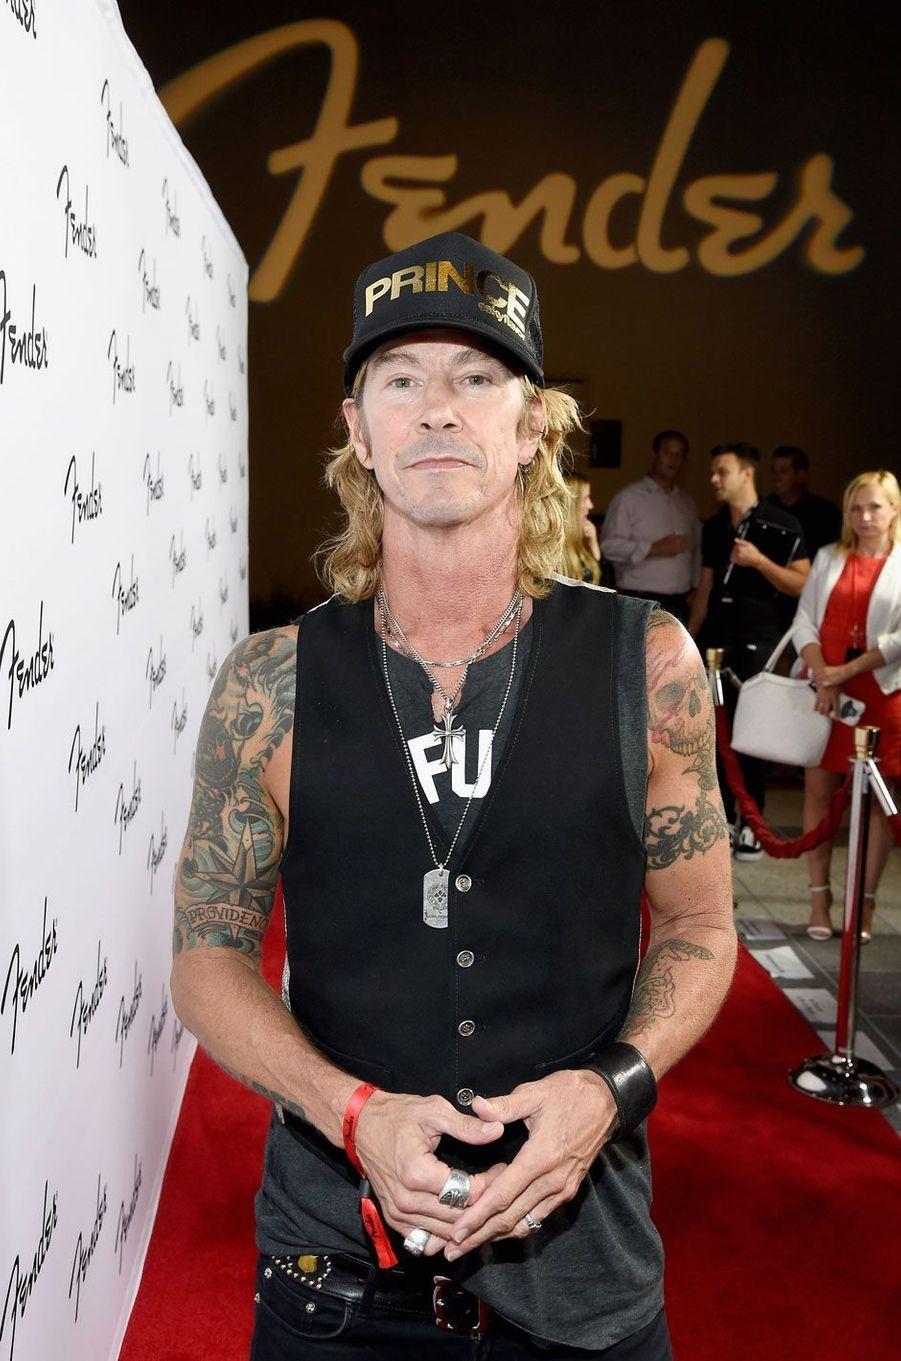 Guns N' Roses, 84 millions de dollars